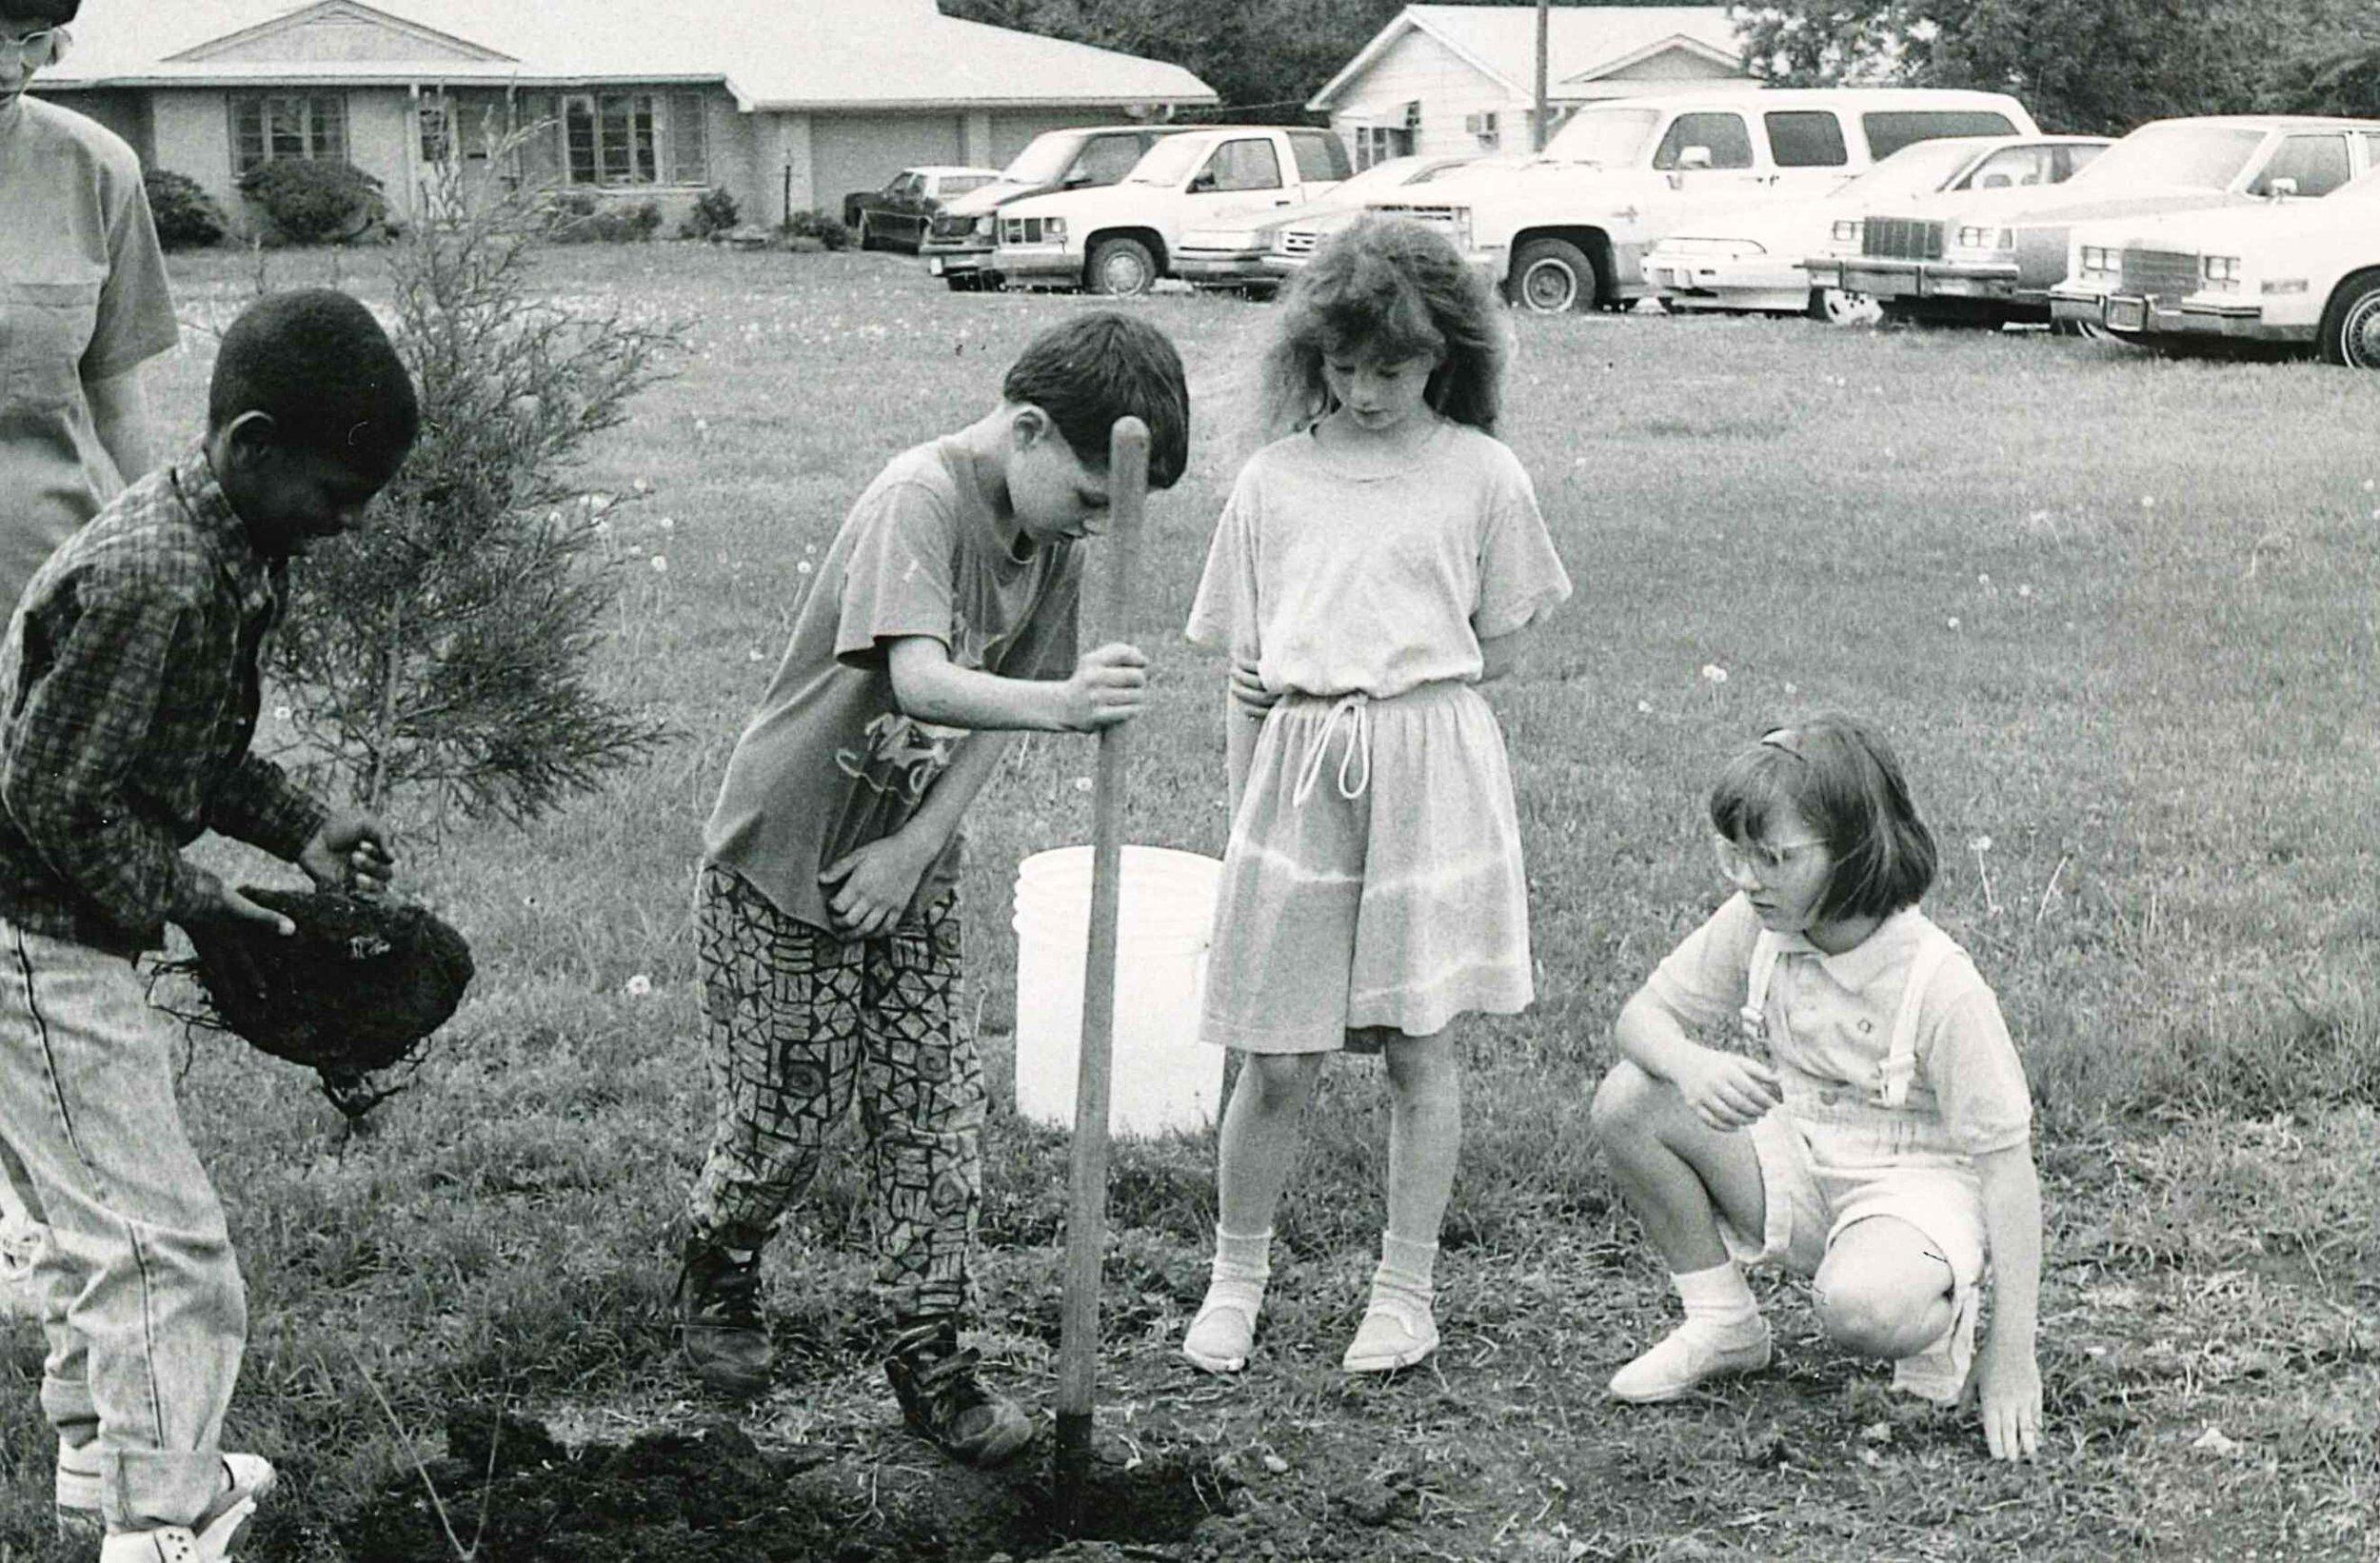 Earth Day Plantings Trees 2 - 1980s.jpg